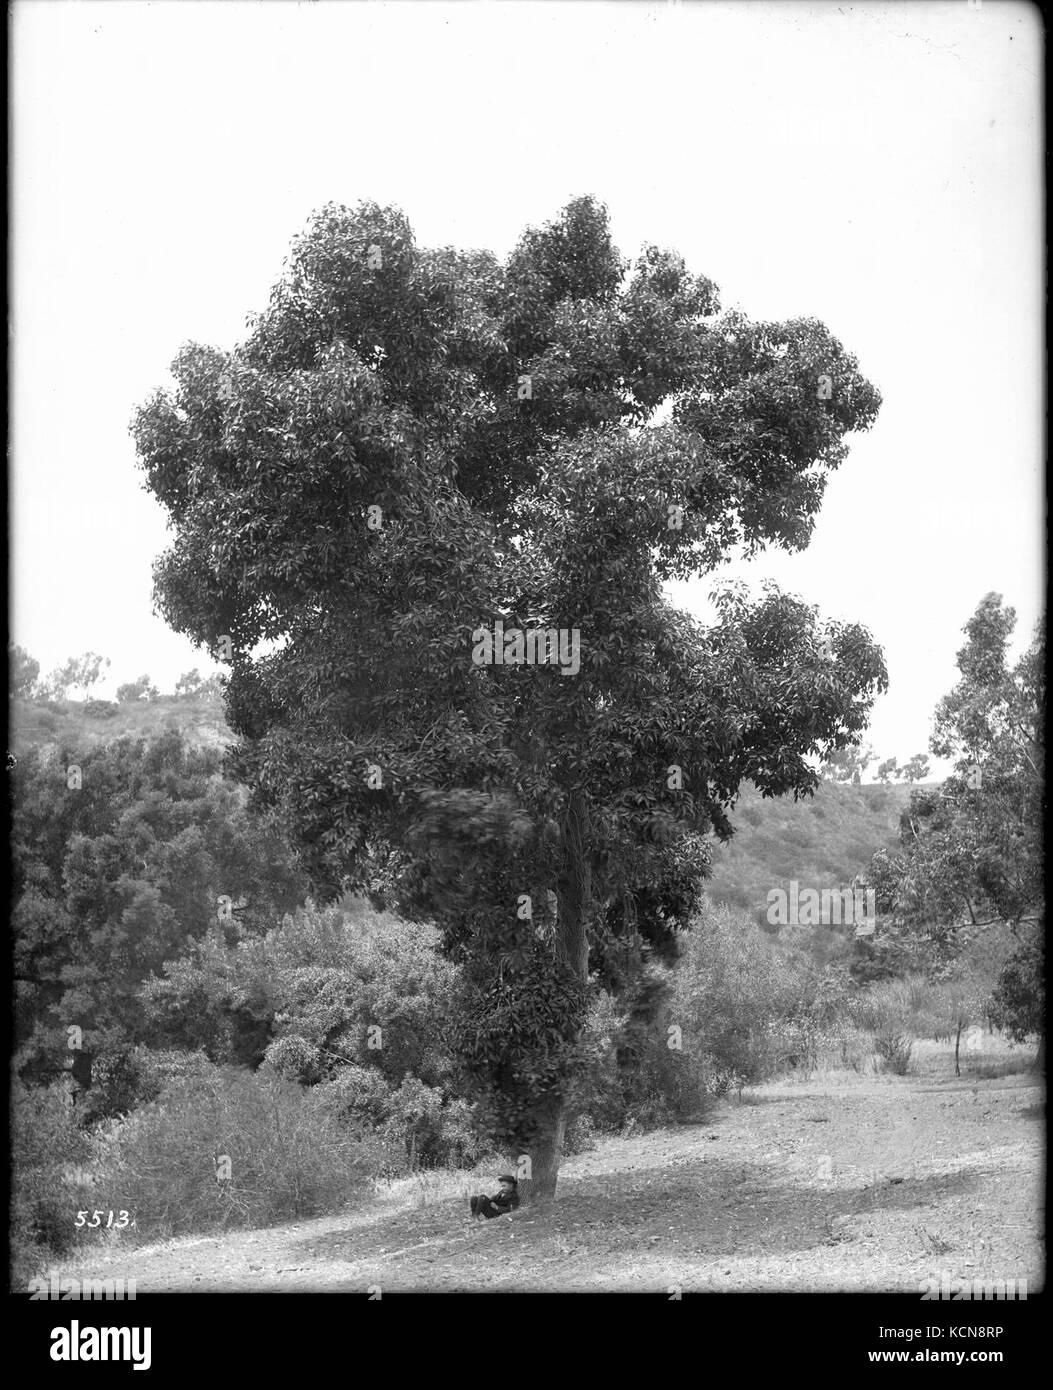 Eucalyptus trees, ca.1900 (CHS 5513) - Stock Image